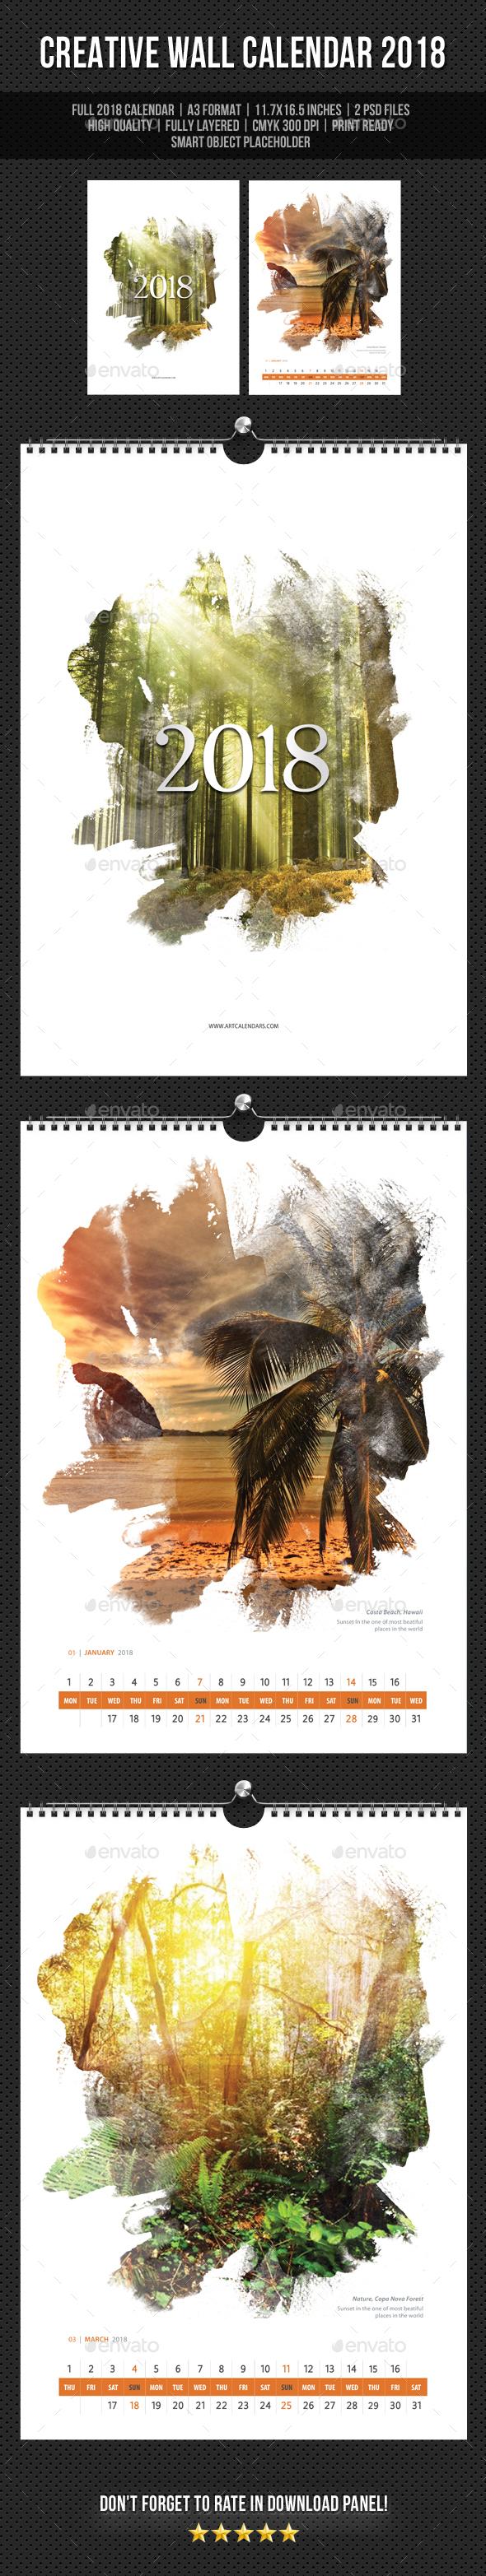 Creative Wall Calendar 2018 V15